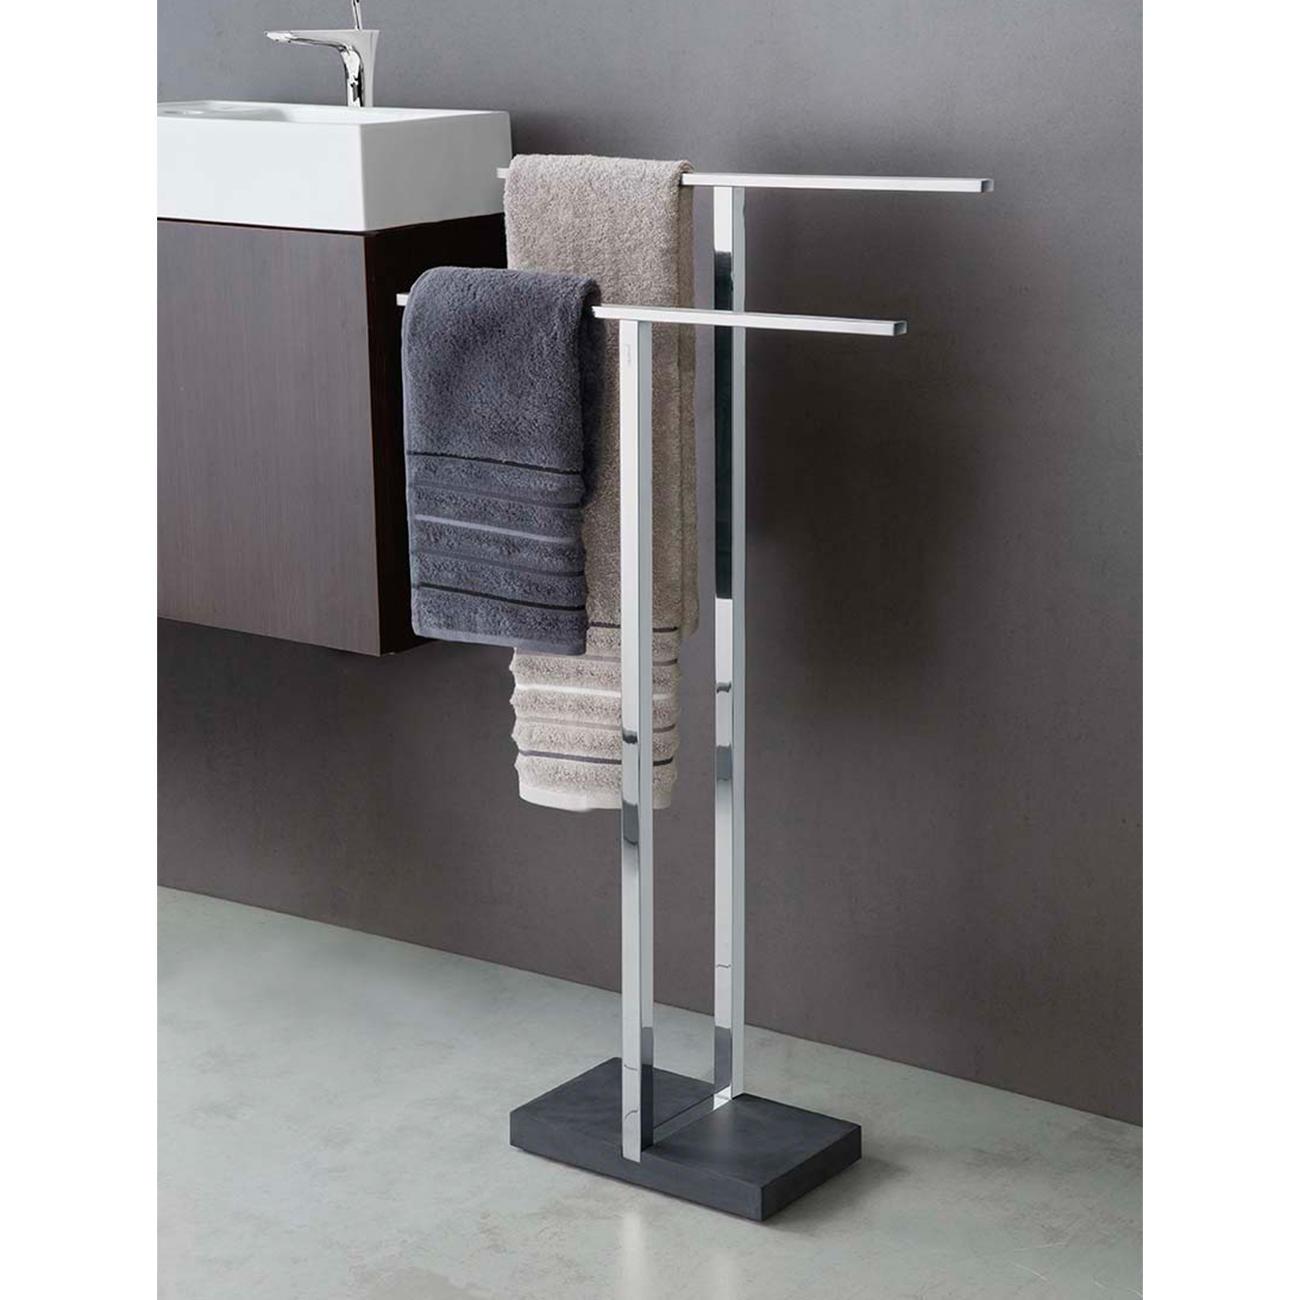 polystone handtuchhalter oder polystone wc butler kaufen. Black Bedroom Furniture Sets. Home Design Ideas